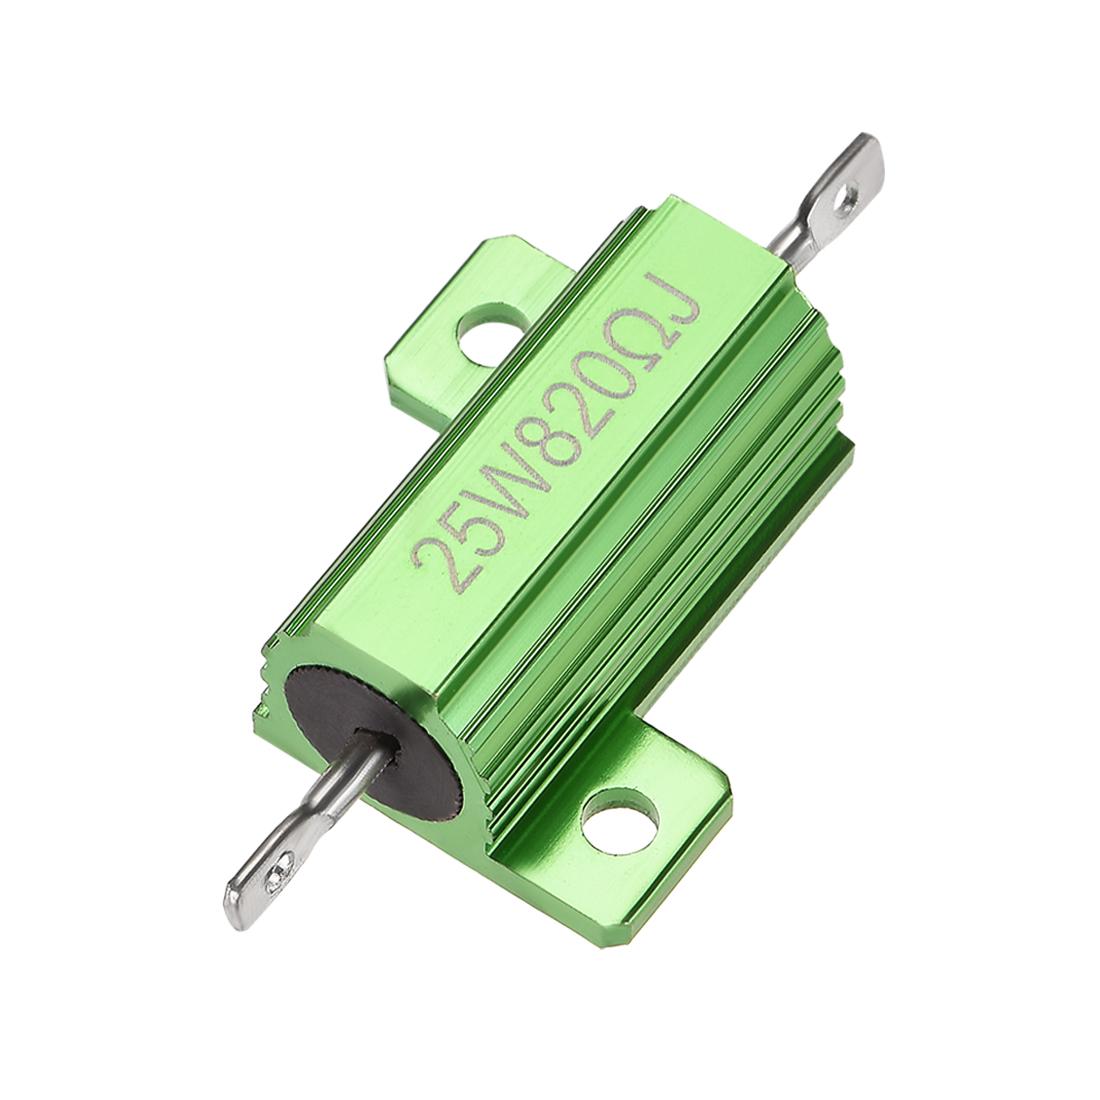 25W 820 Ohm 5% Aluminum Housing Resistor Wirewound Resistor Green Tone 1 Pcs